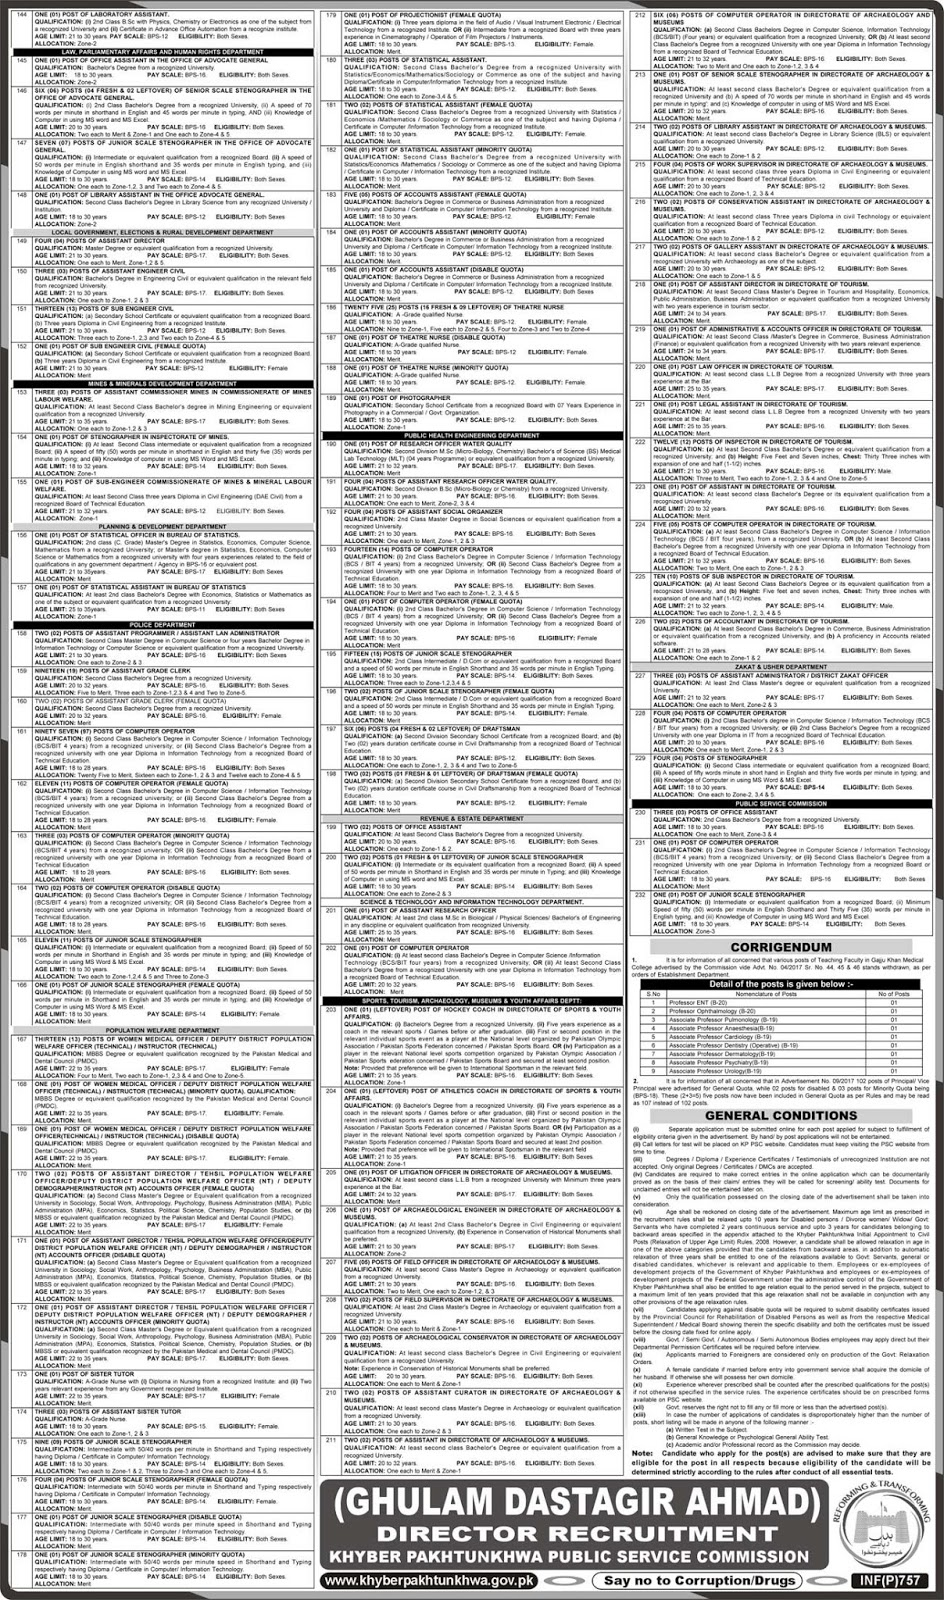 New Latest KPPSC Jobs Advertisement No. 3/2018 (3130 Vacancies), www.kppsc.gov.pk